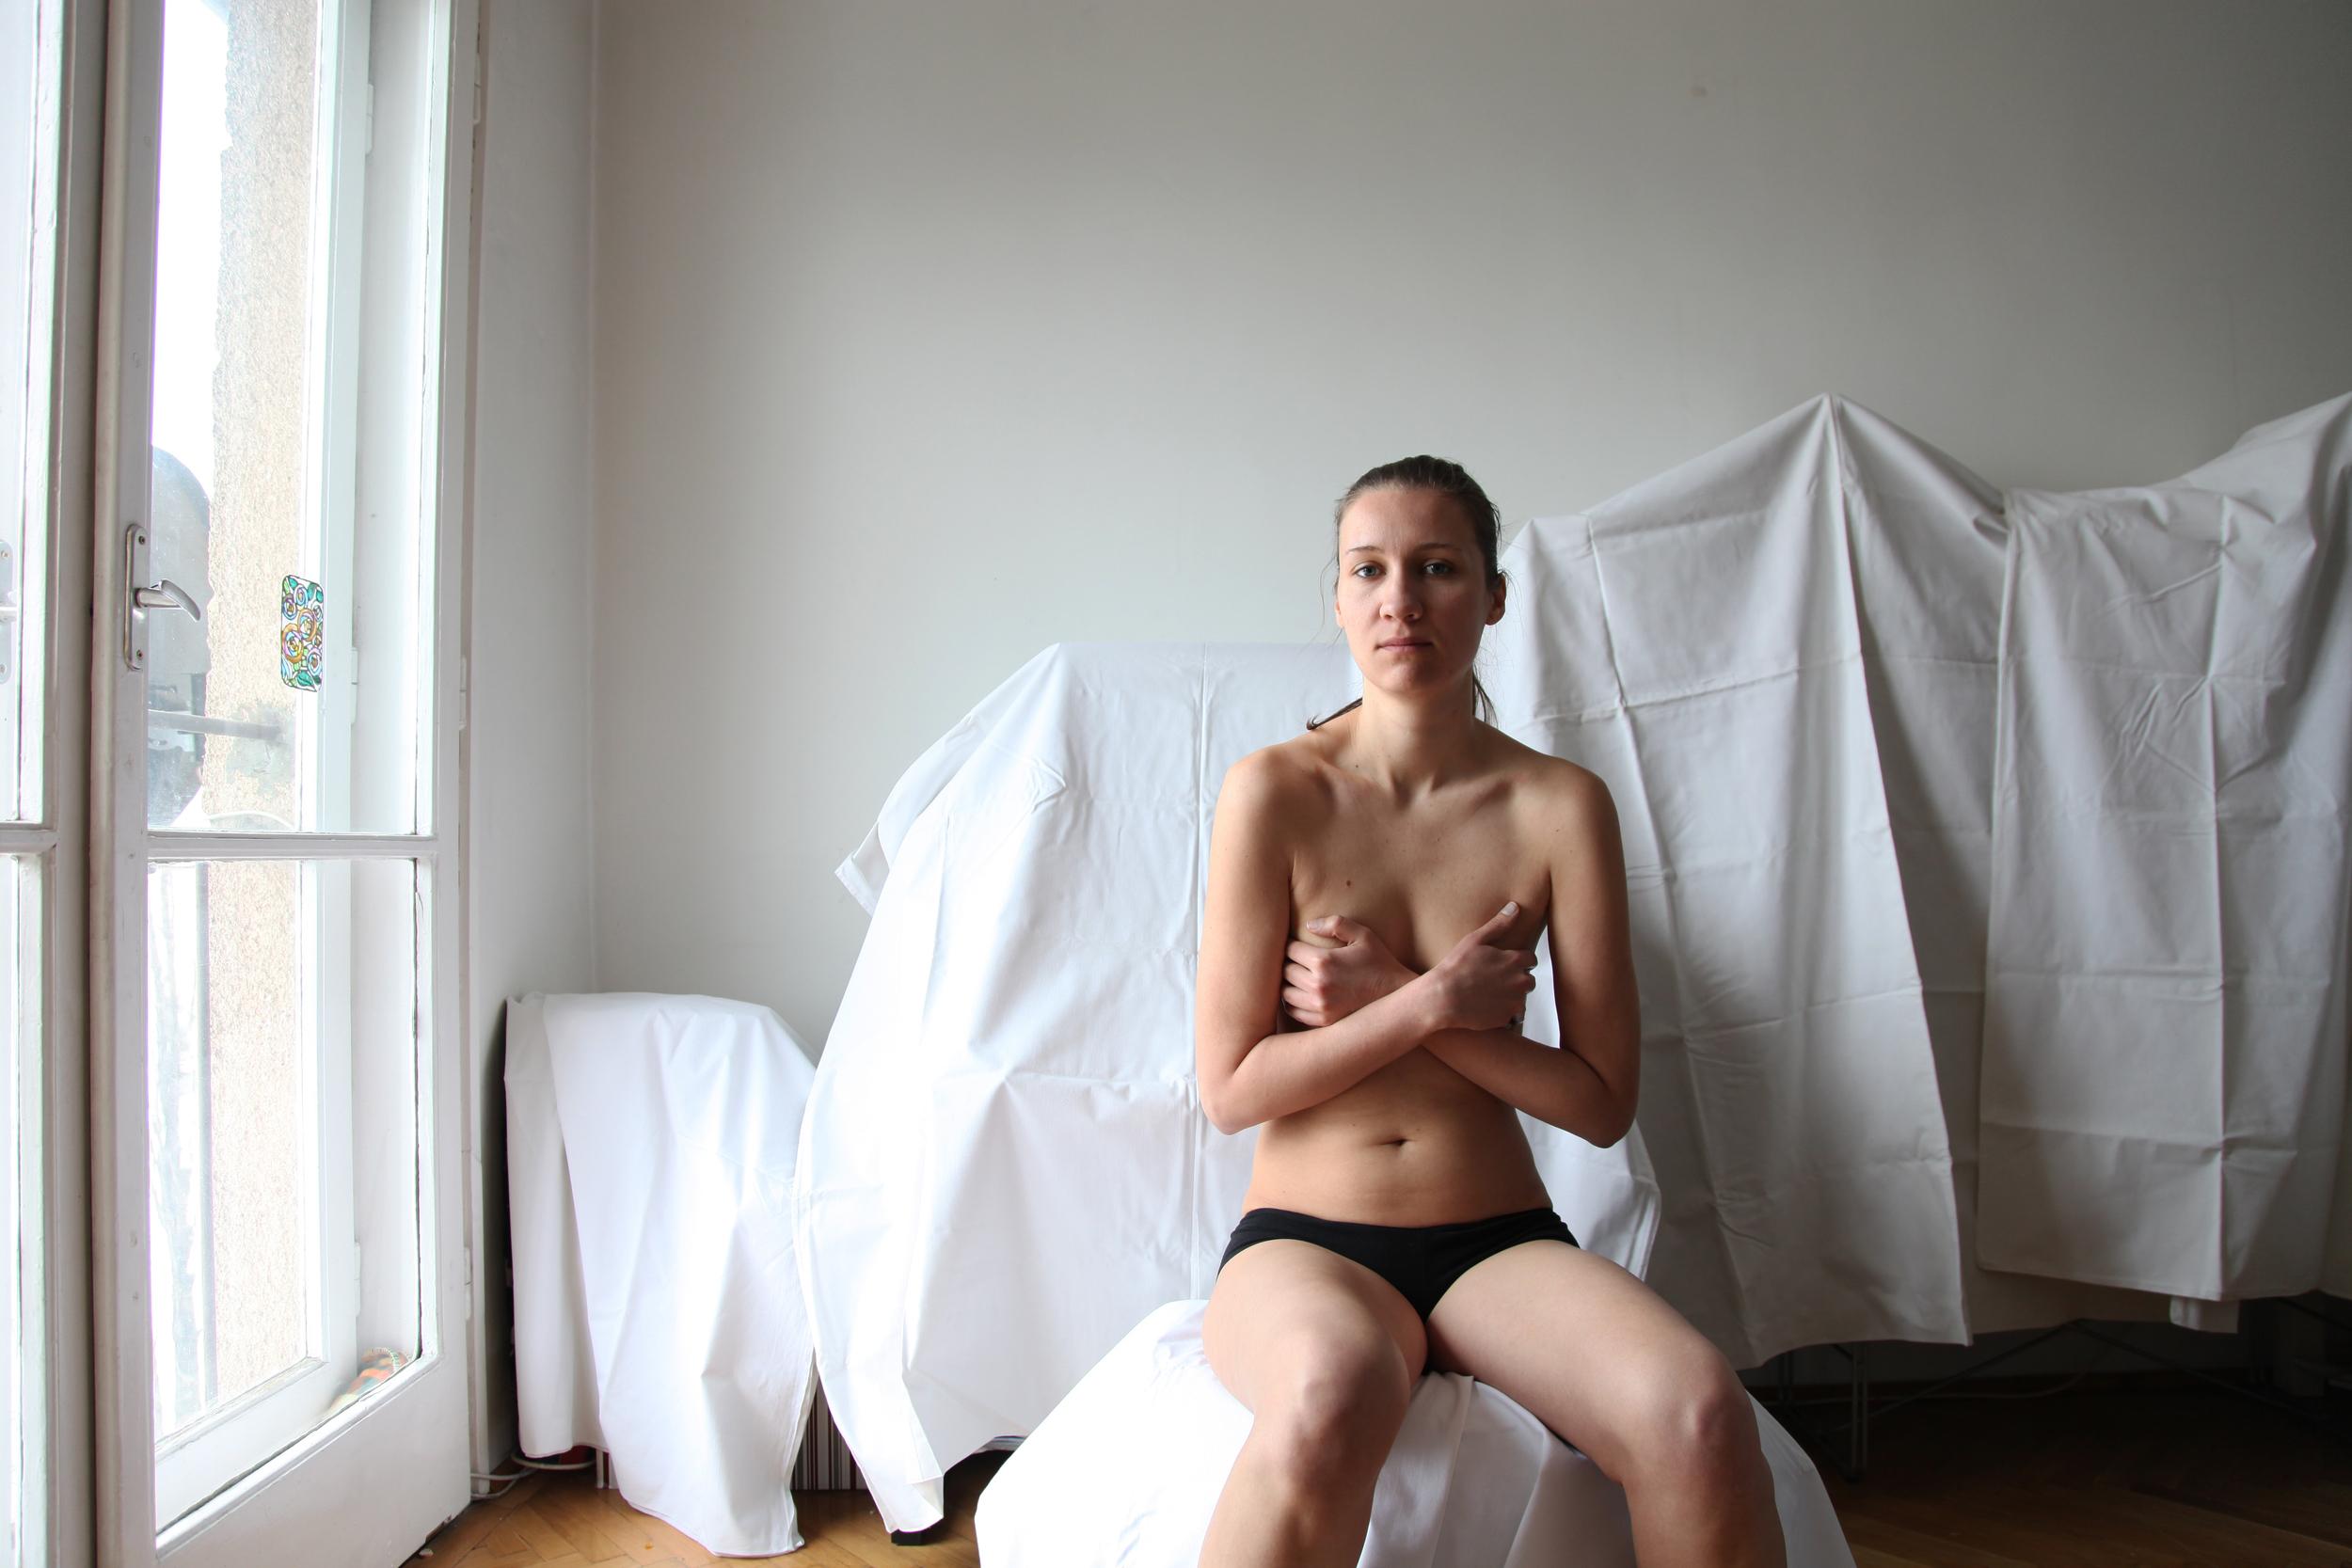 annagyurkovics-untitled-02